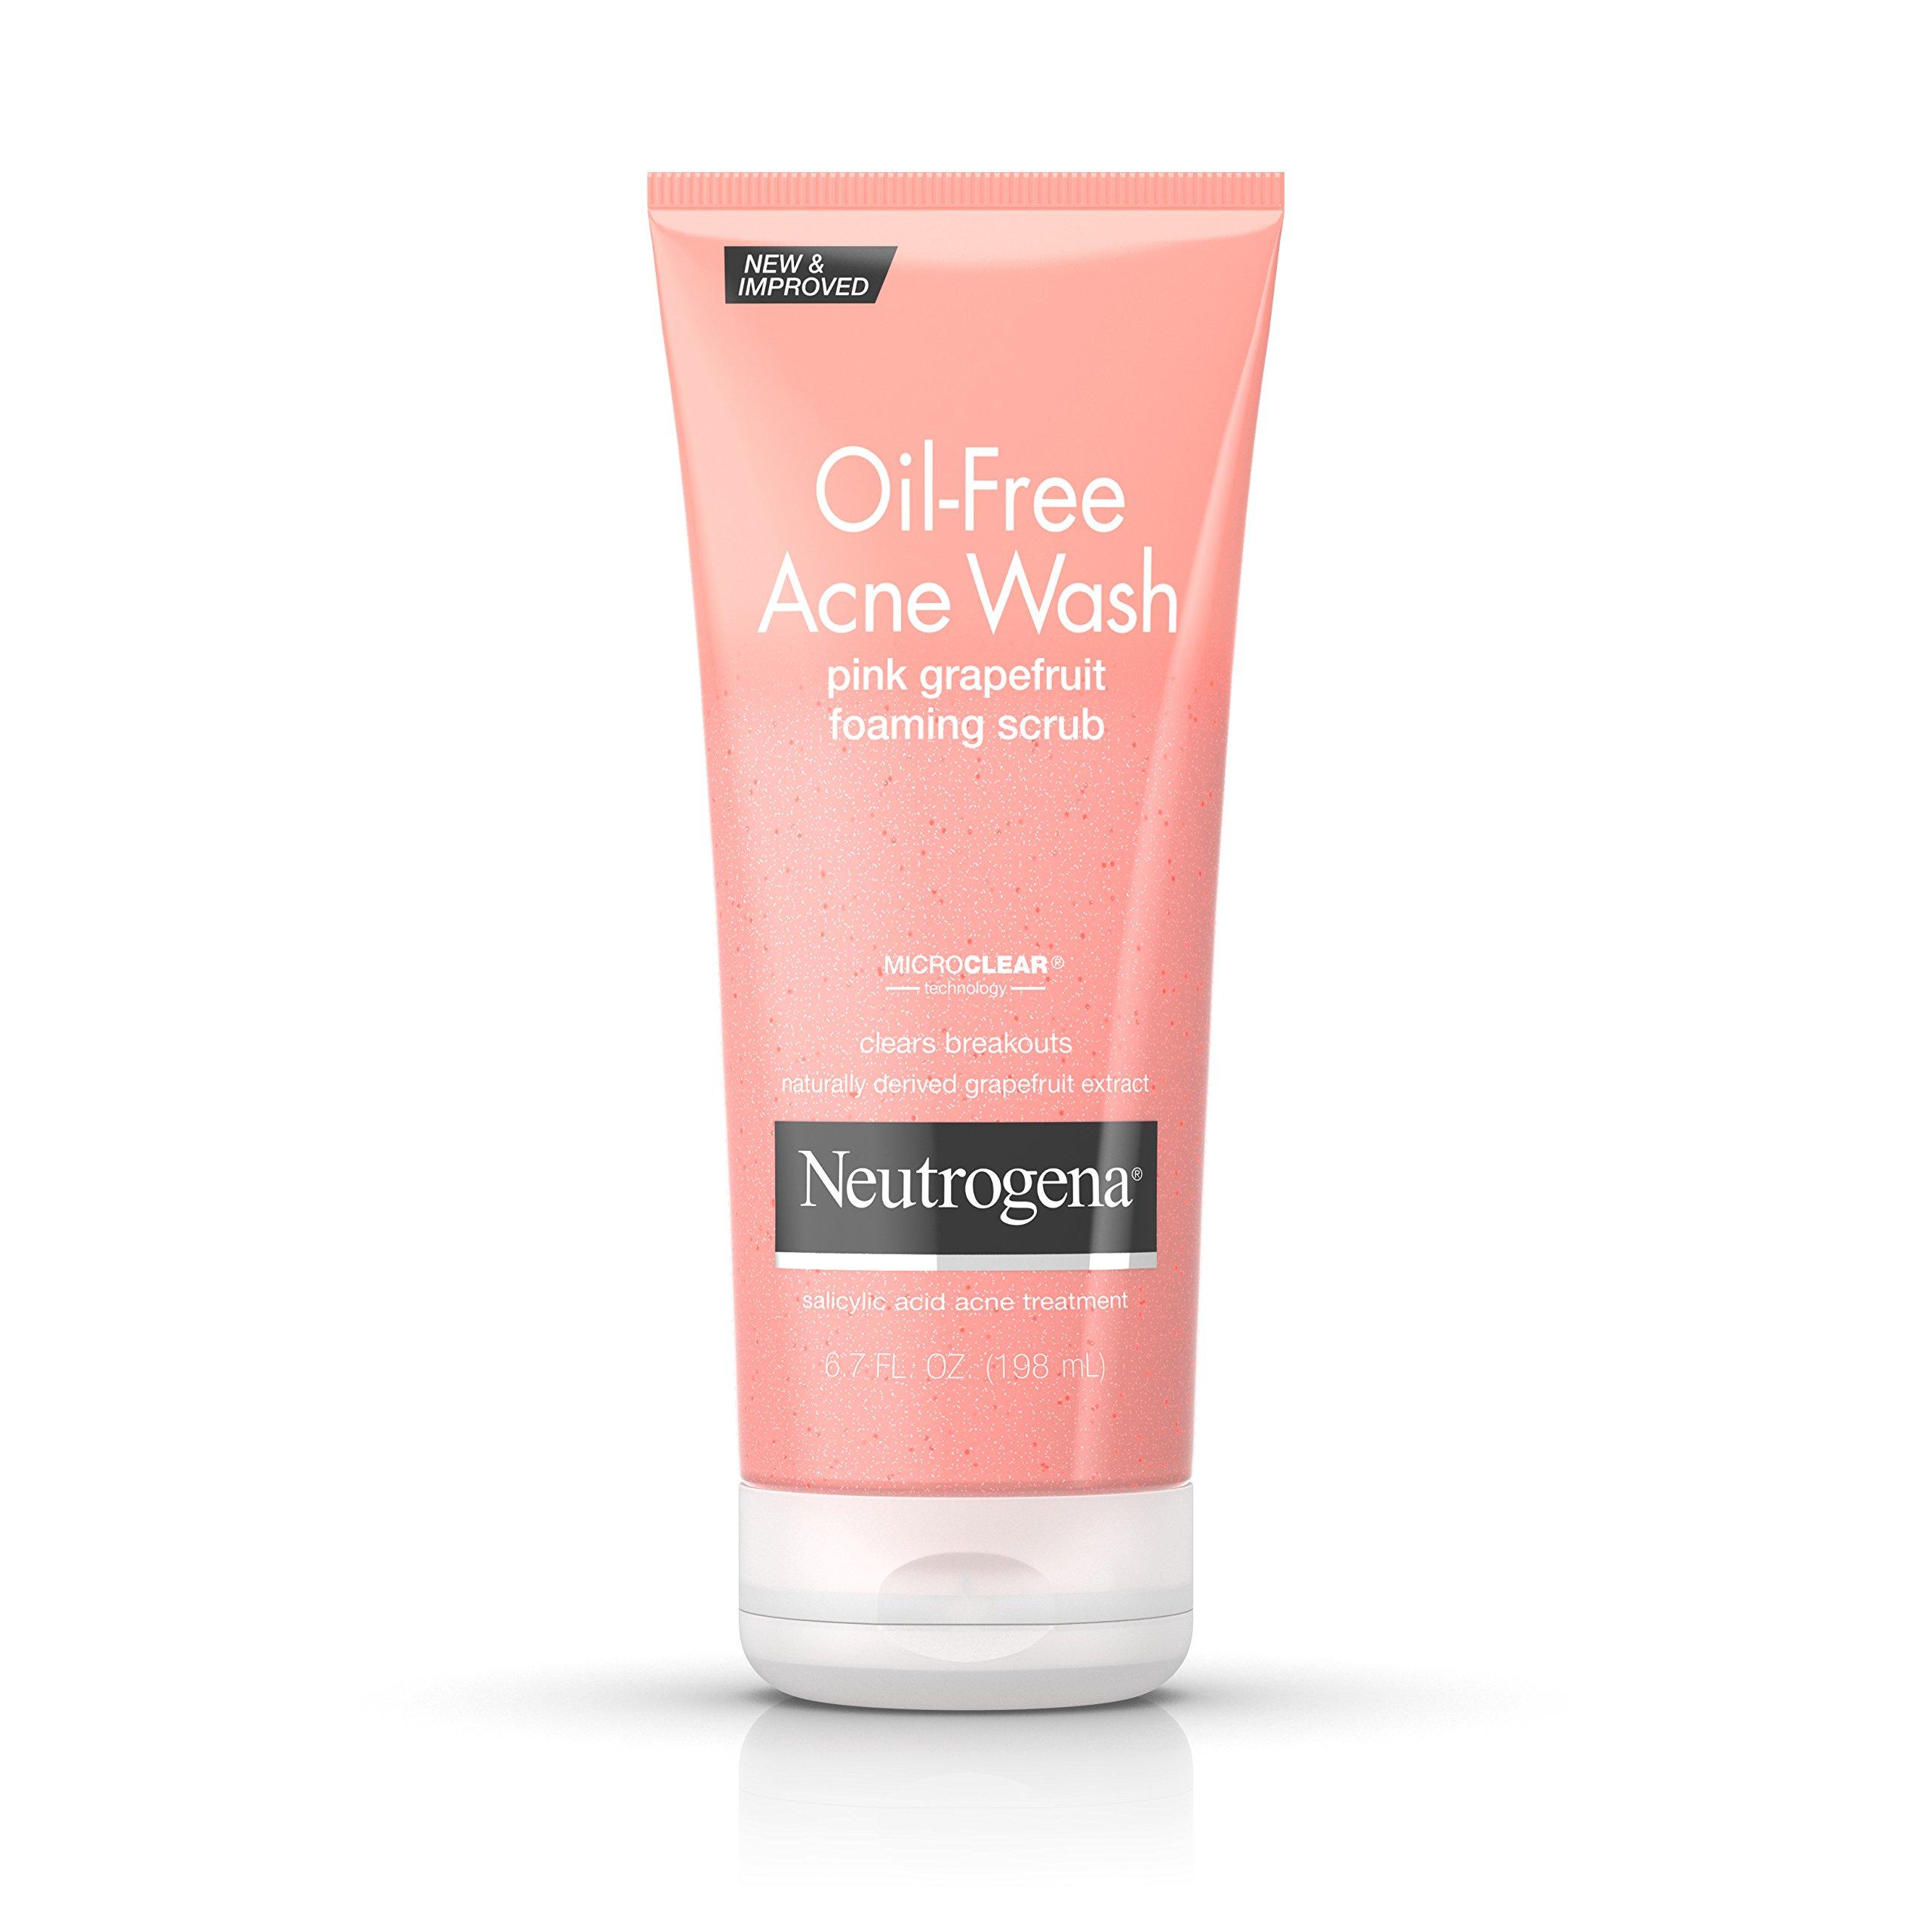 Neutrogena Oil-Free Acne Face Wash Pink Grapefruit Foaming Scrub, Salicylic Acid Acne Treatment, 6.7 Fl. Oz. (Pack of 3)